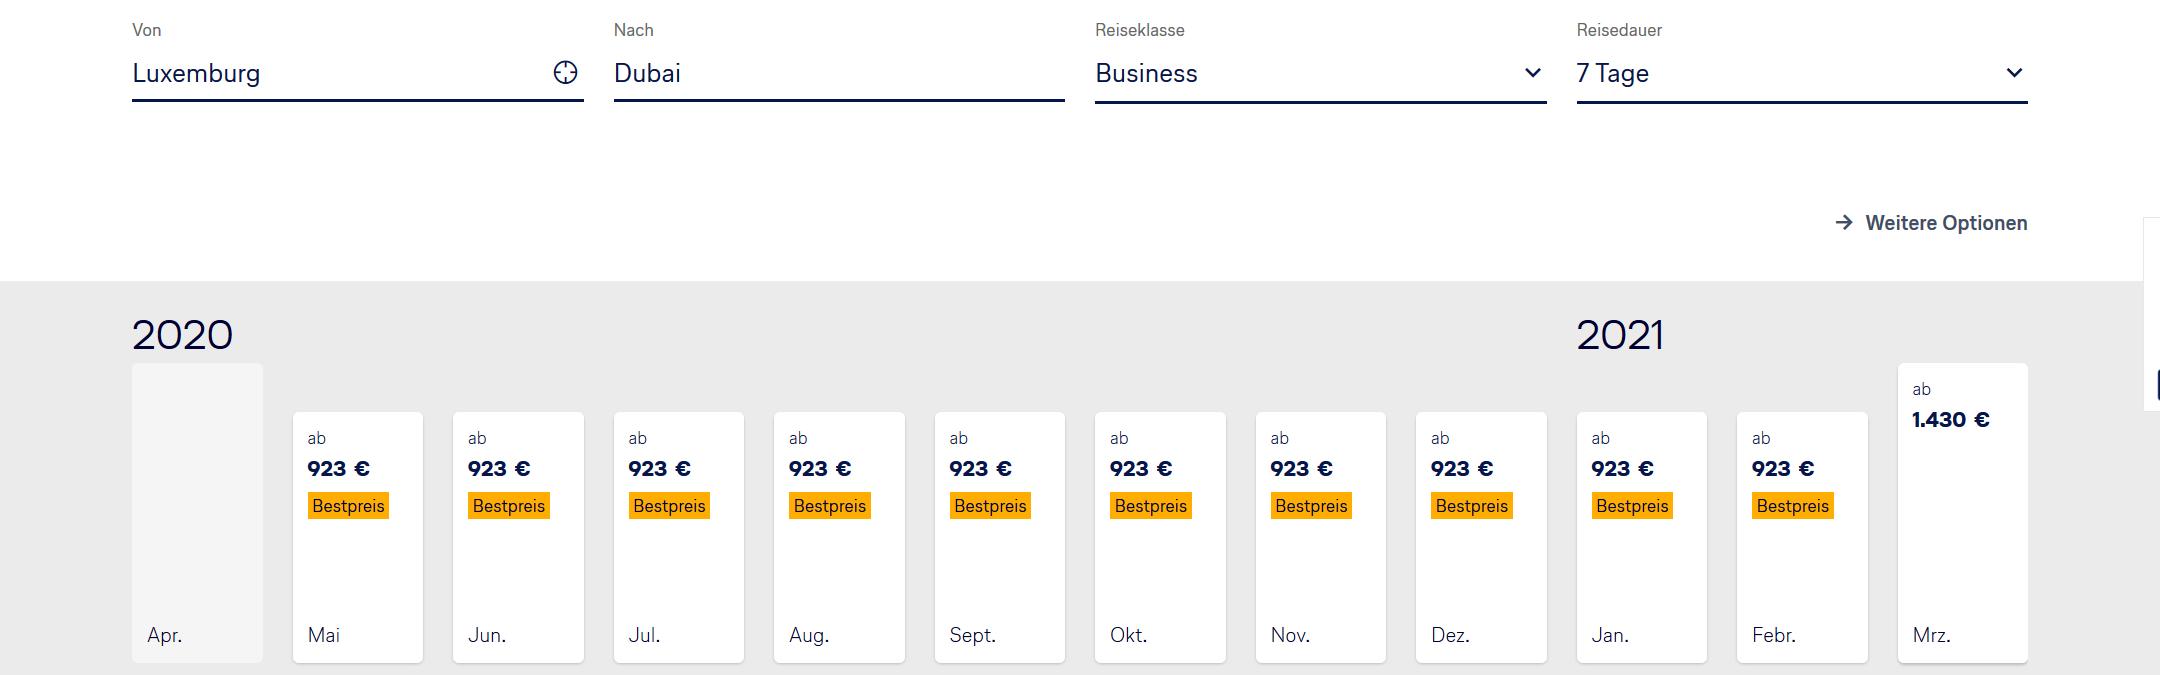 Lufthansa Bestpreissuche Business Class Luxemburg Dubai